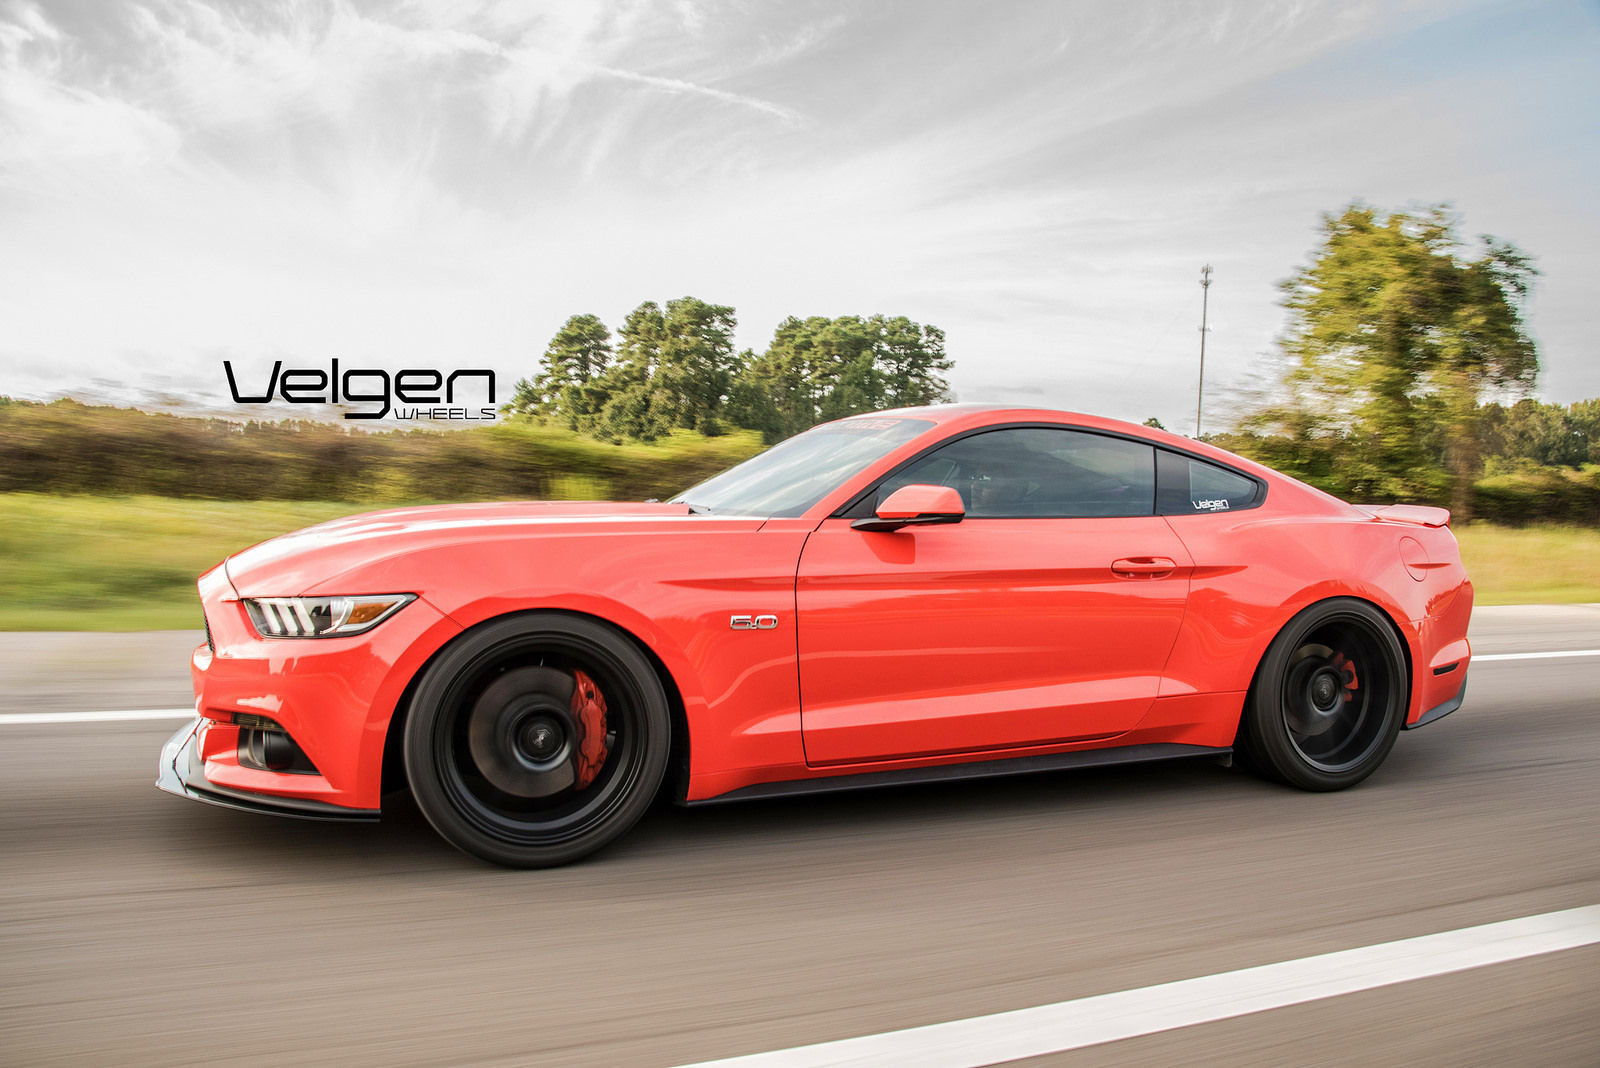 2015 Competition Orange Mustang Gt Velgen Wheels Rolling